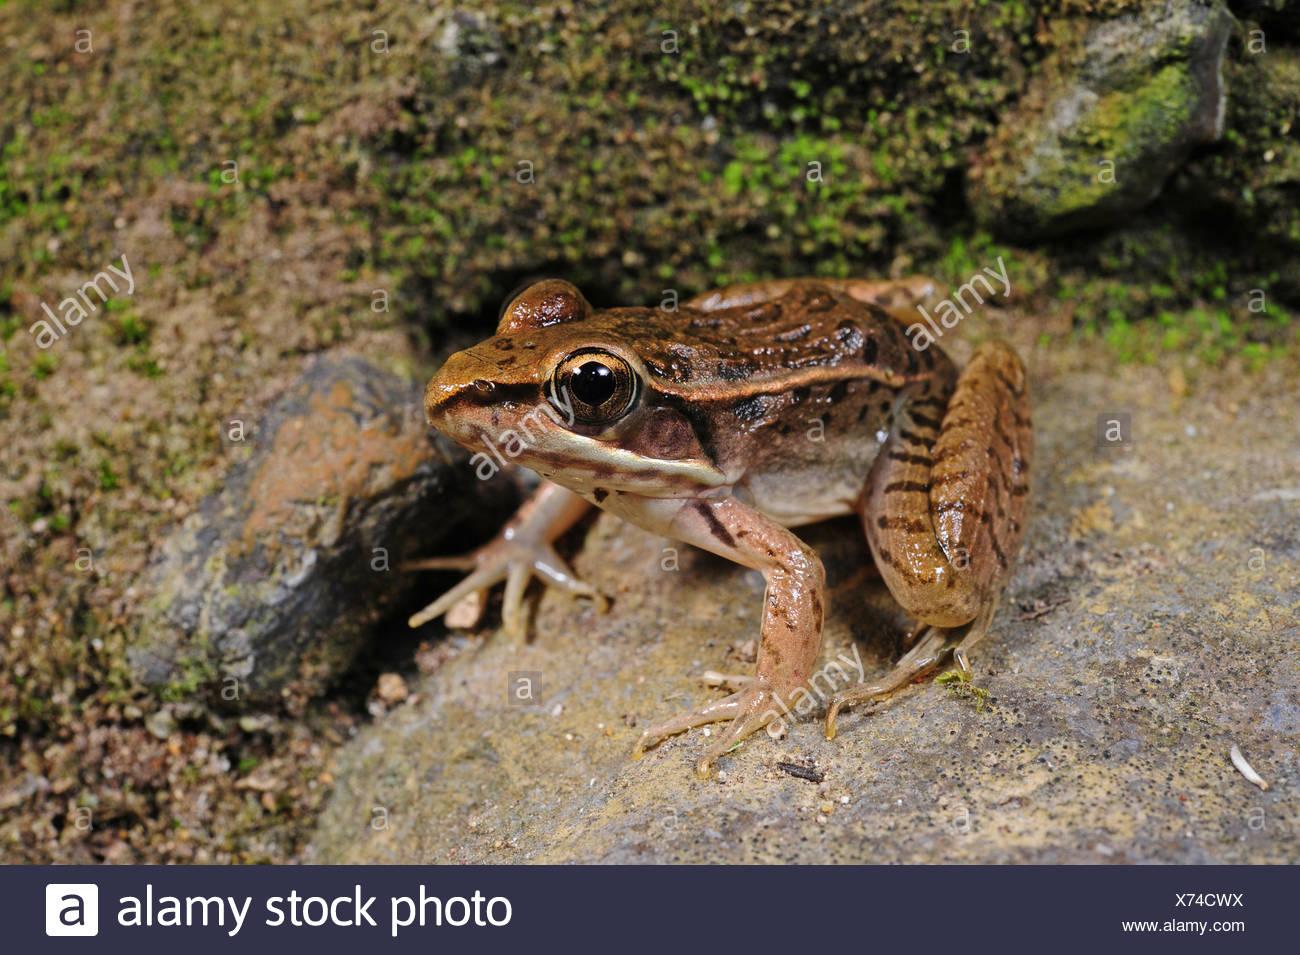 frog (Lithobates cf. berlandieri), Honduras, Copan - Stock Image